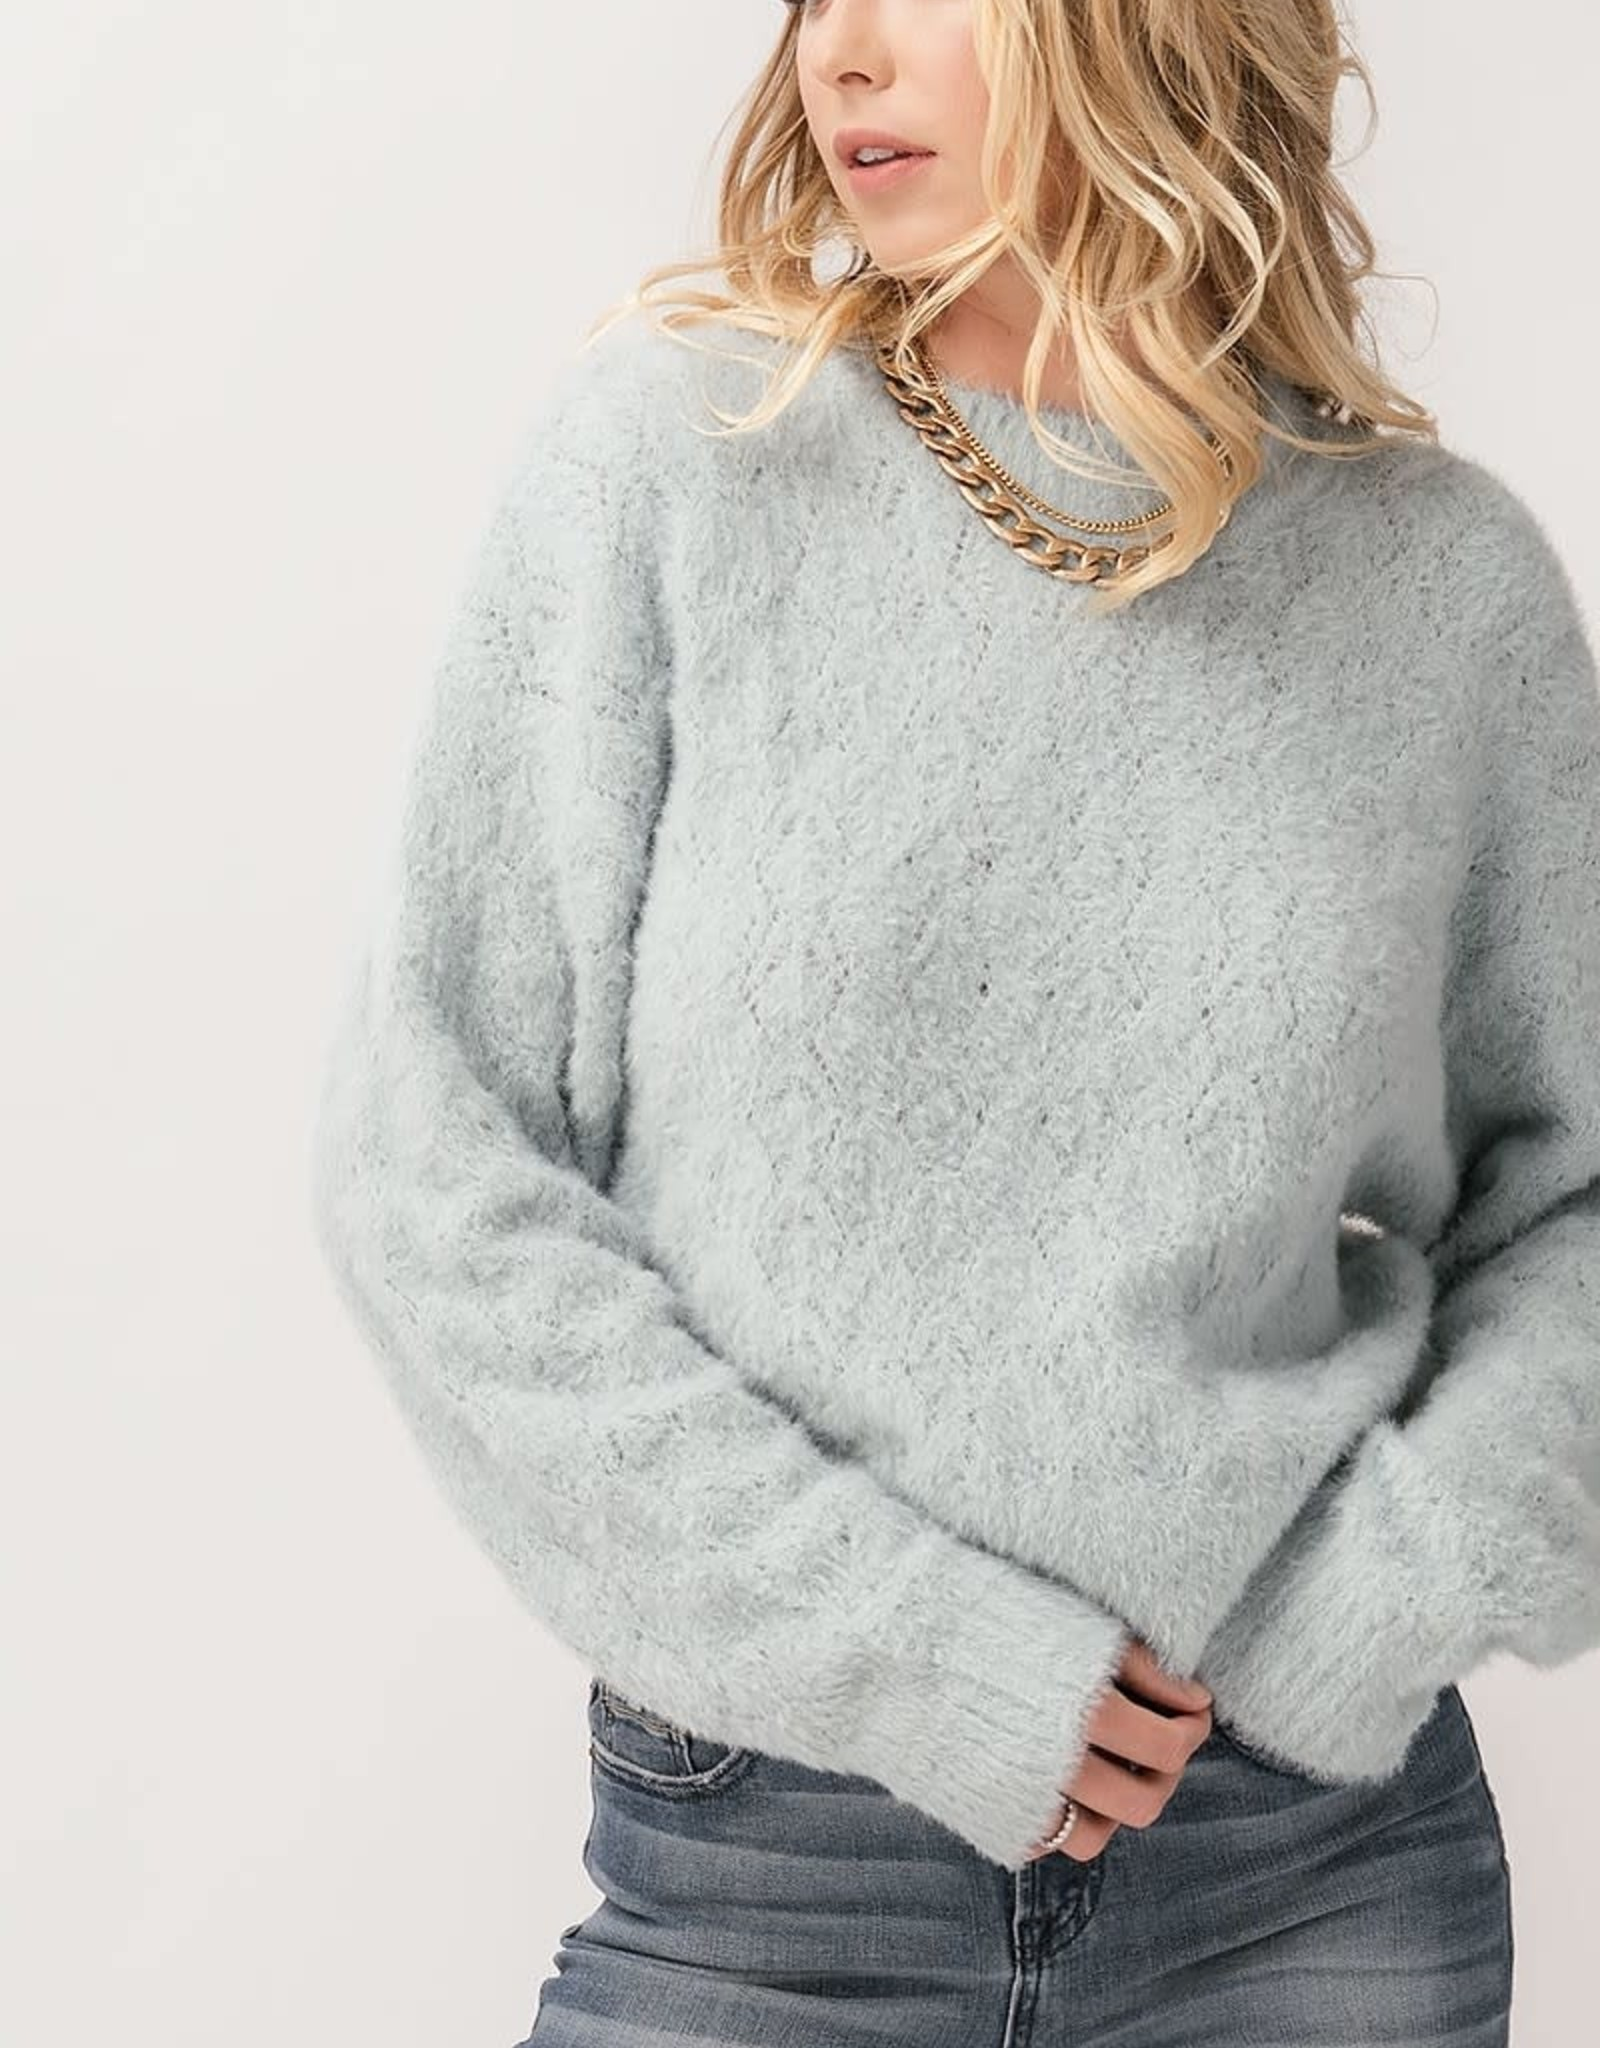 Miss Bliss Fuzzy Knit Sweater-